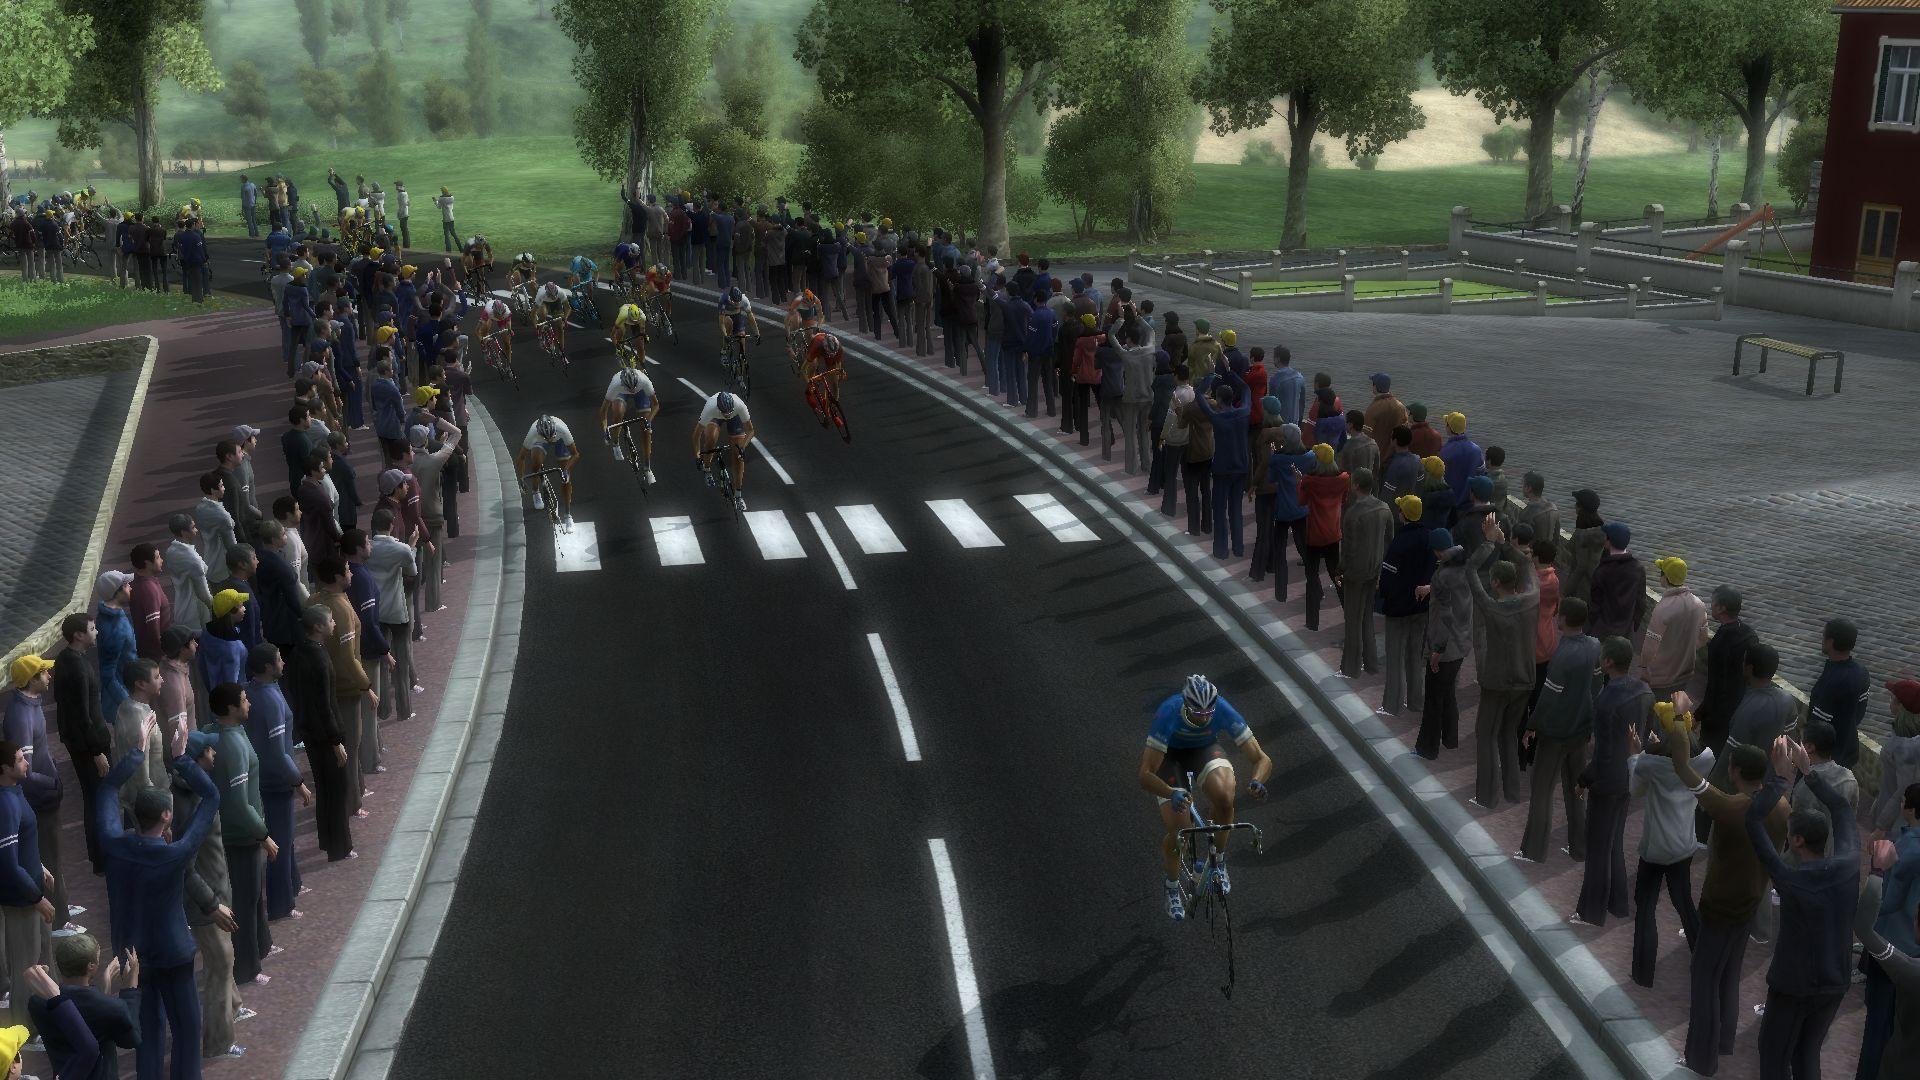 pcmdaily.com/images/mg/2017/Races/PT/TONE/TNES3%2025.jpg